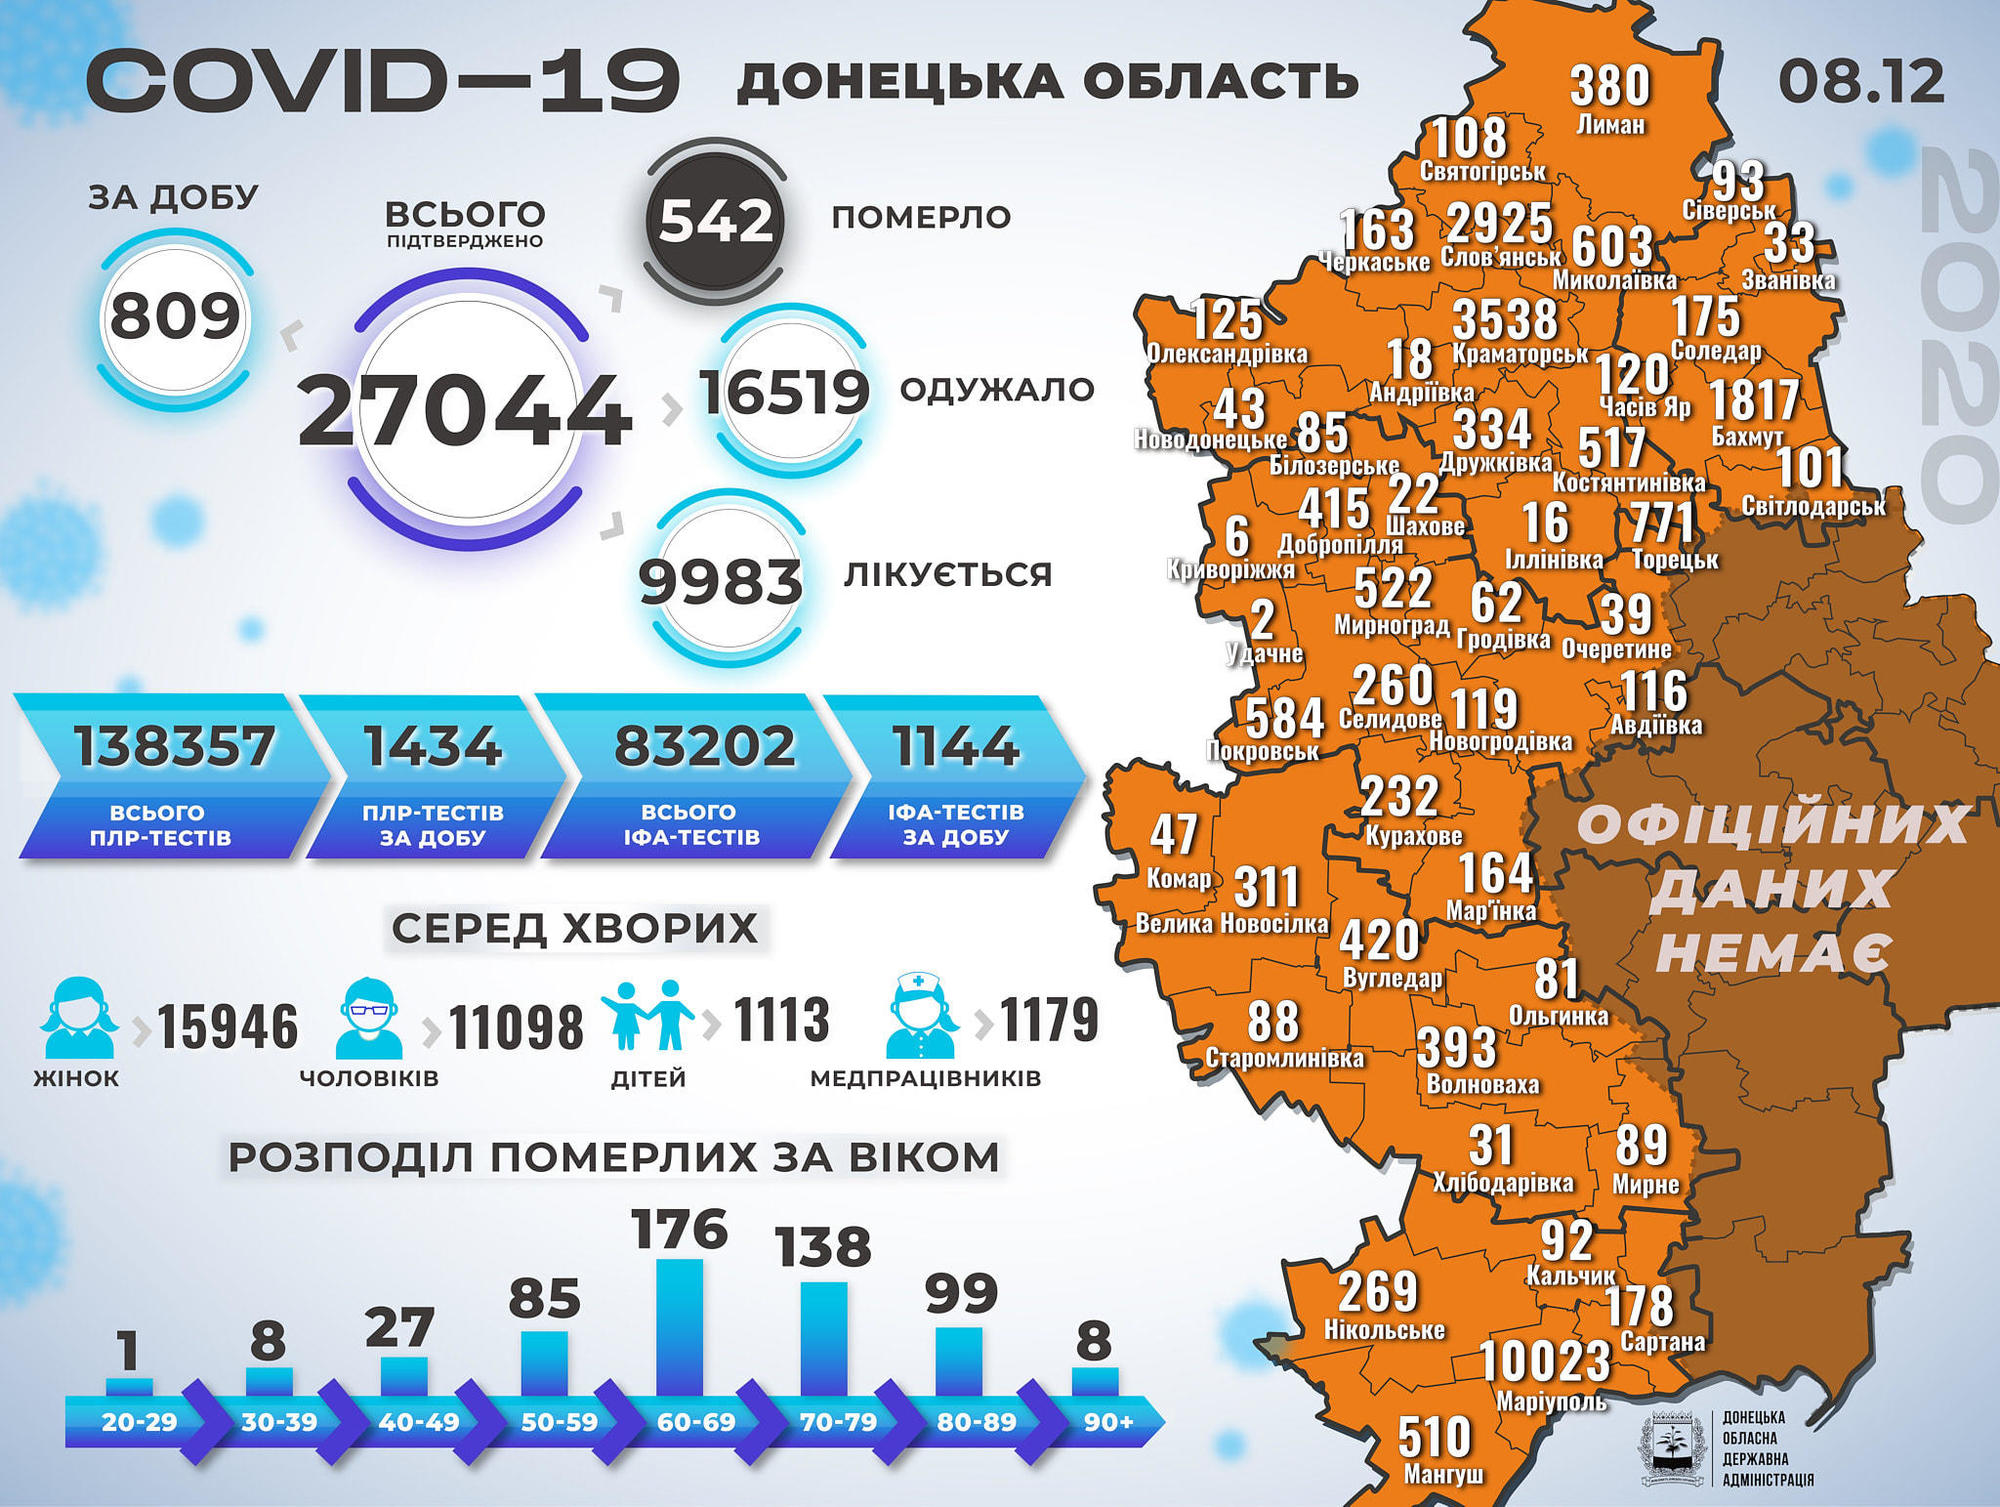 COVID-19 на Донетчине: за сутки инфекцию обнаружили у 40 детей